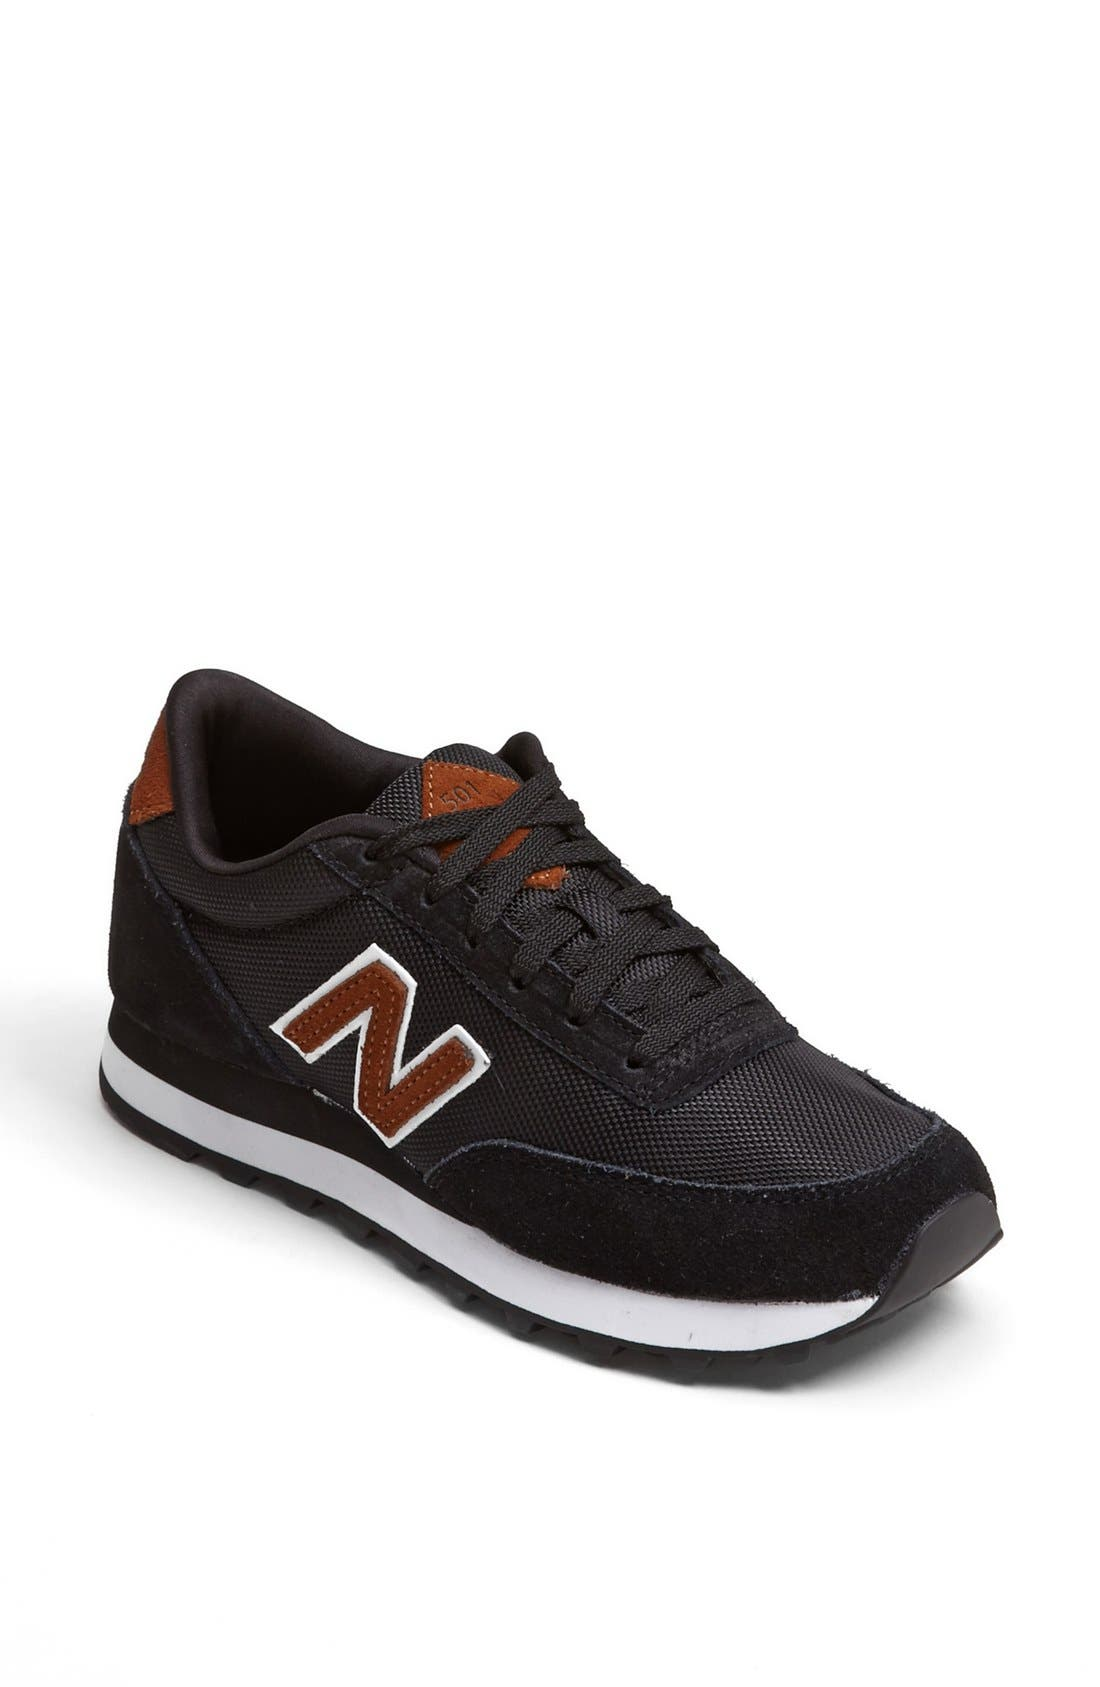 Main Image - New Balance 'Backpack' Sneaker (Women)